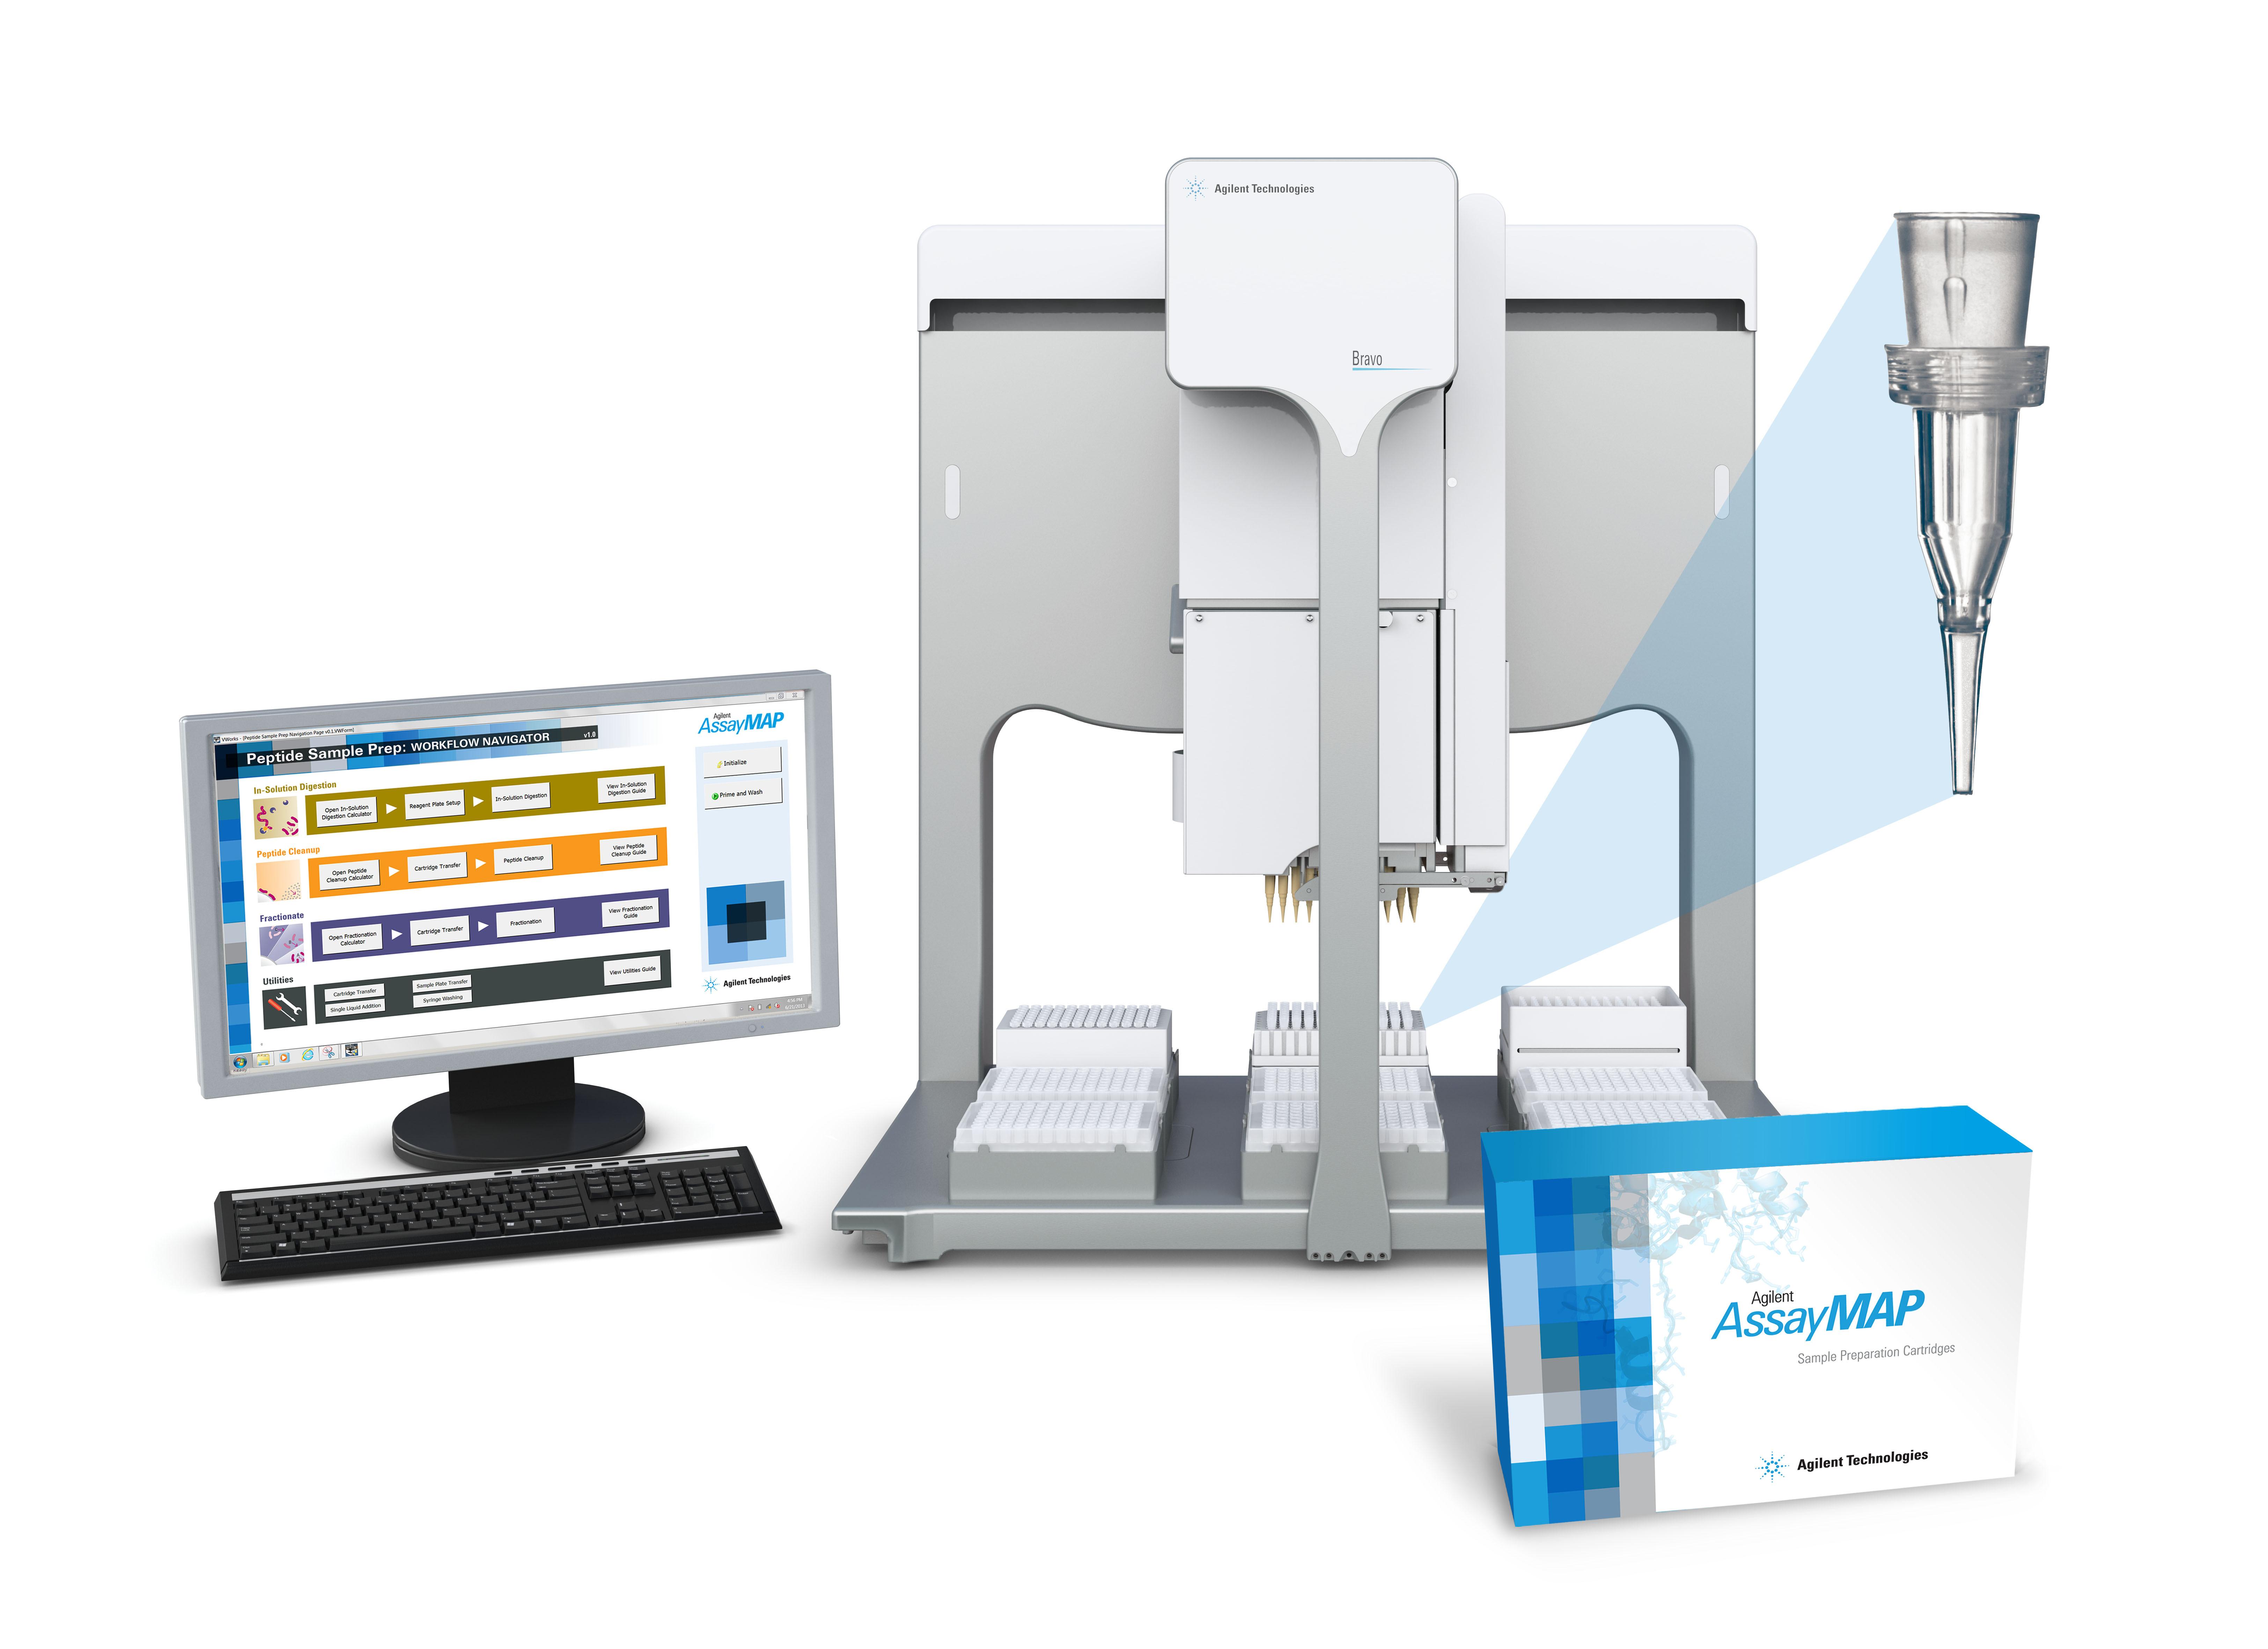 TRADE NEWS: Agilent Technologies Launches New AssayMAP Peptide ...